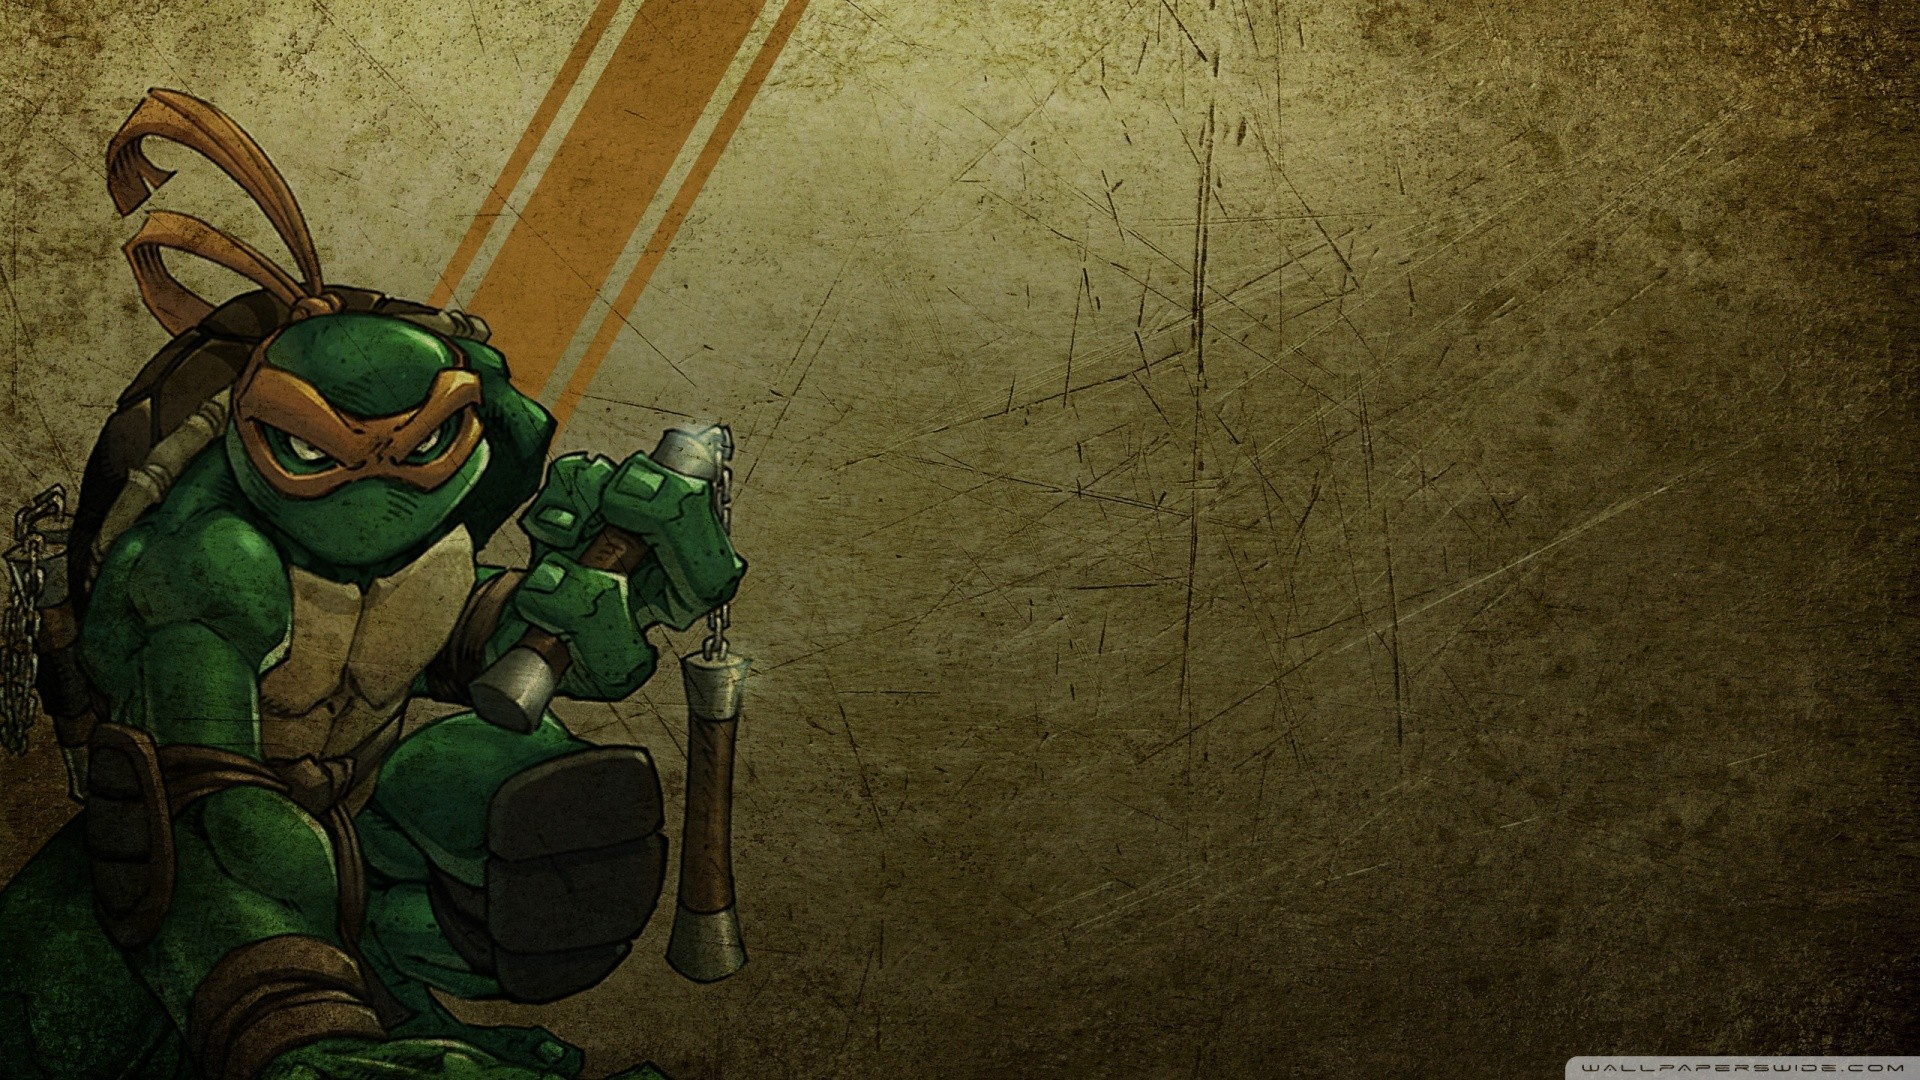 Michelangelo Teenage Mutant Ninja Turtles HD desktop wallpaper   HD  Wallpapers   Pinterest   Wallpaper, Hd desktop and Michelangelo